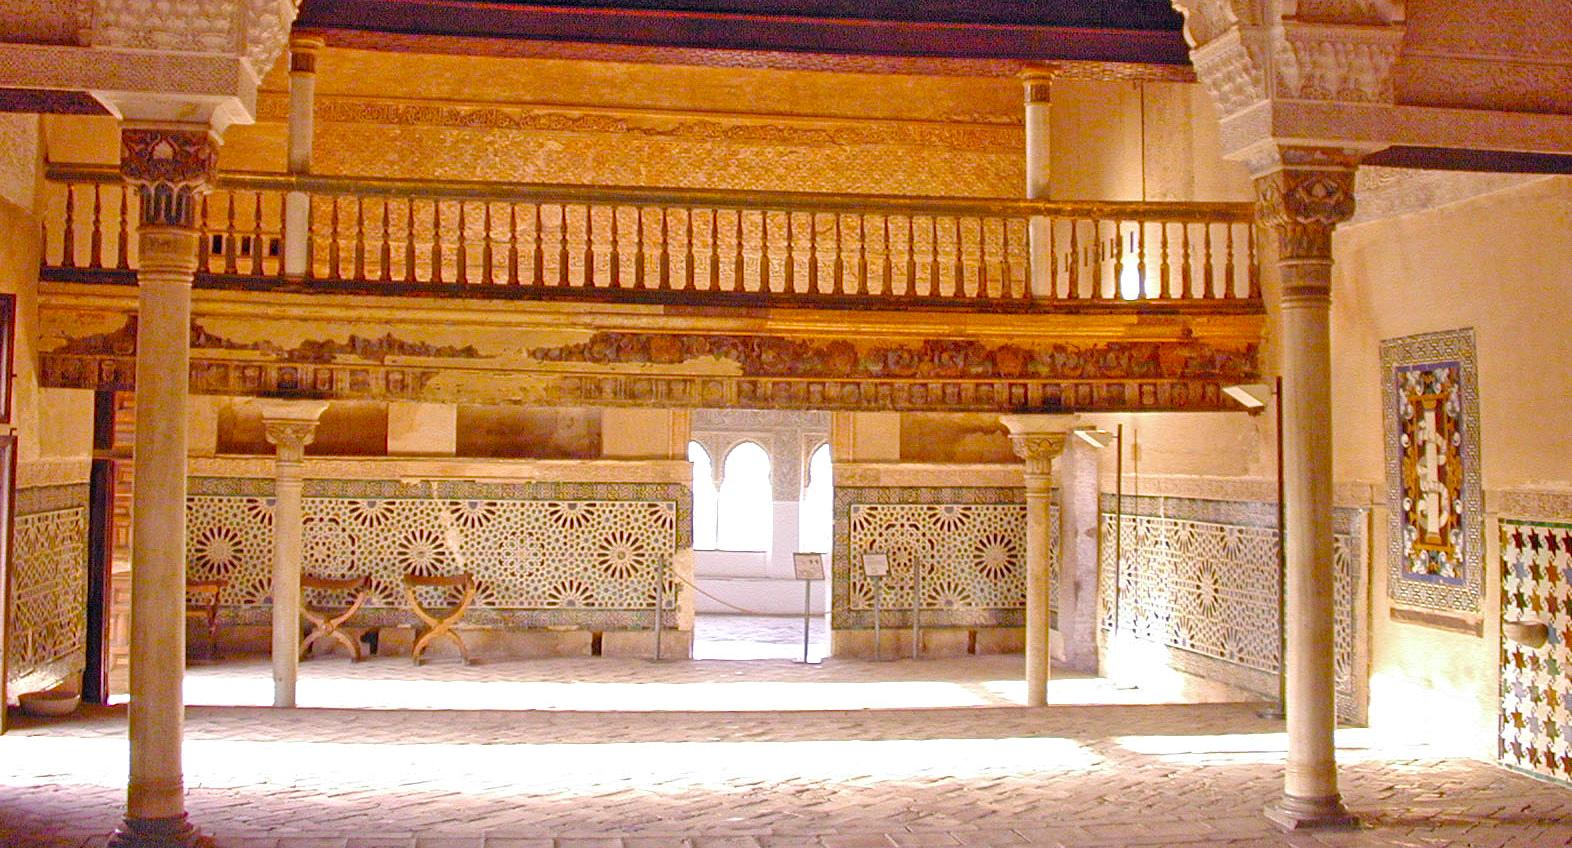 El mexuar zonas de la alhambra noticas de la alhambra for Sala 0 palacio de la prensa